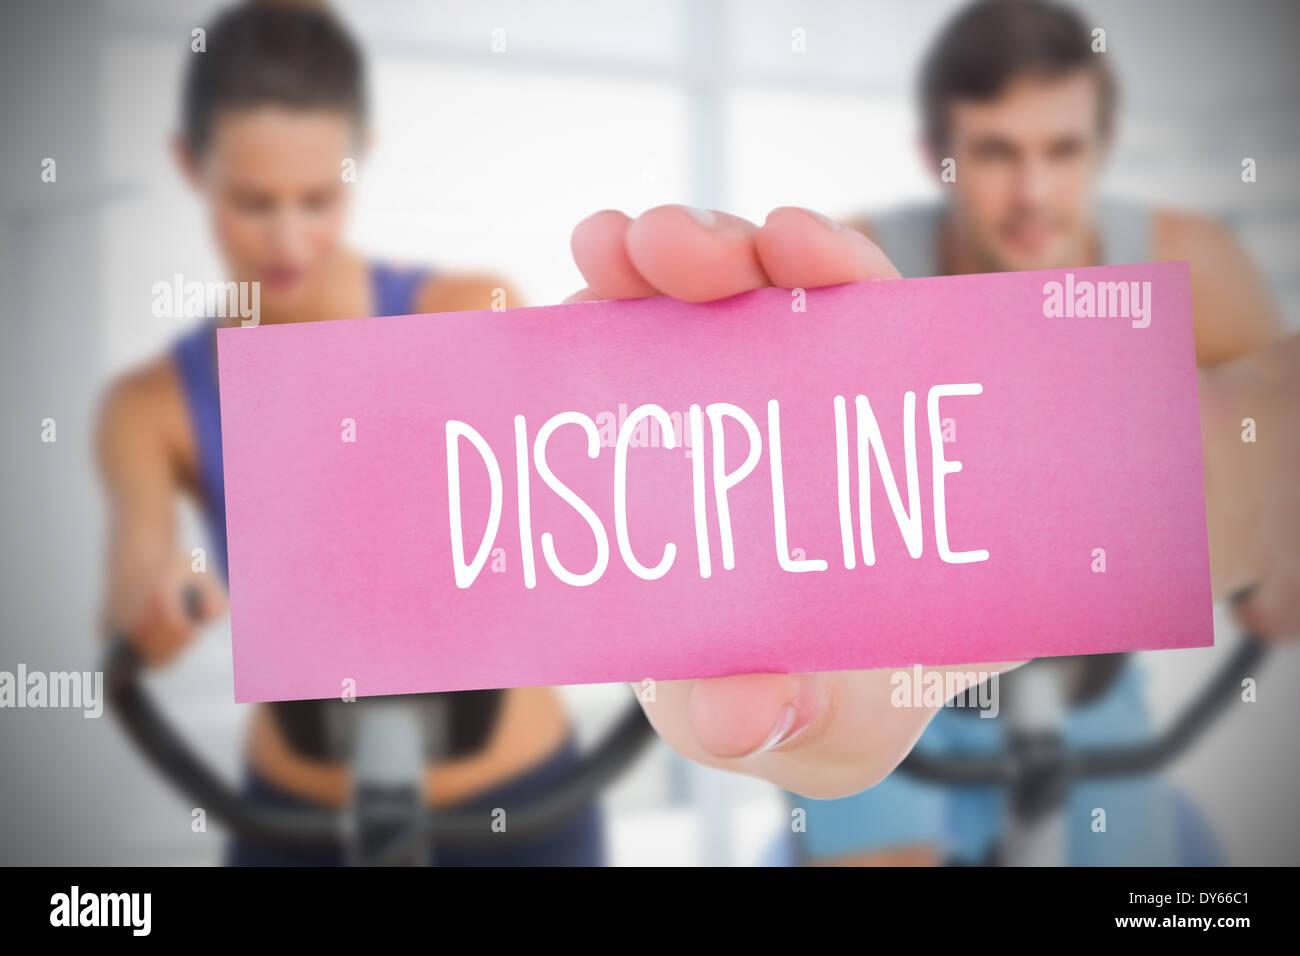 Frau mit rosa Karte Spruch Disziplin Stockbild